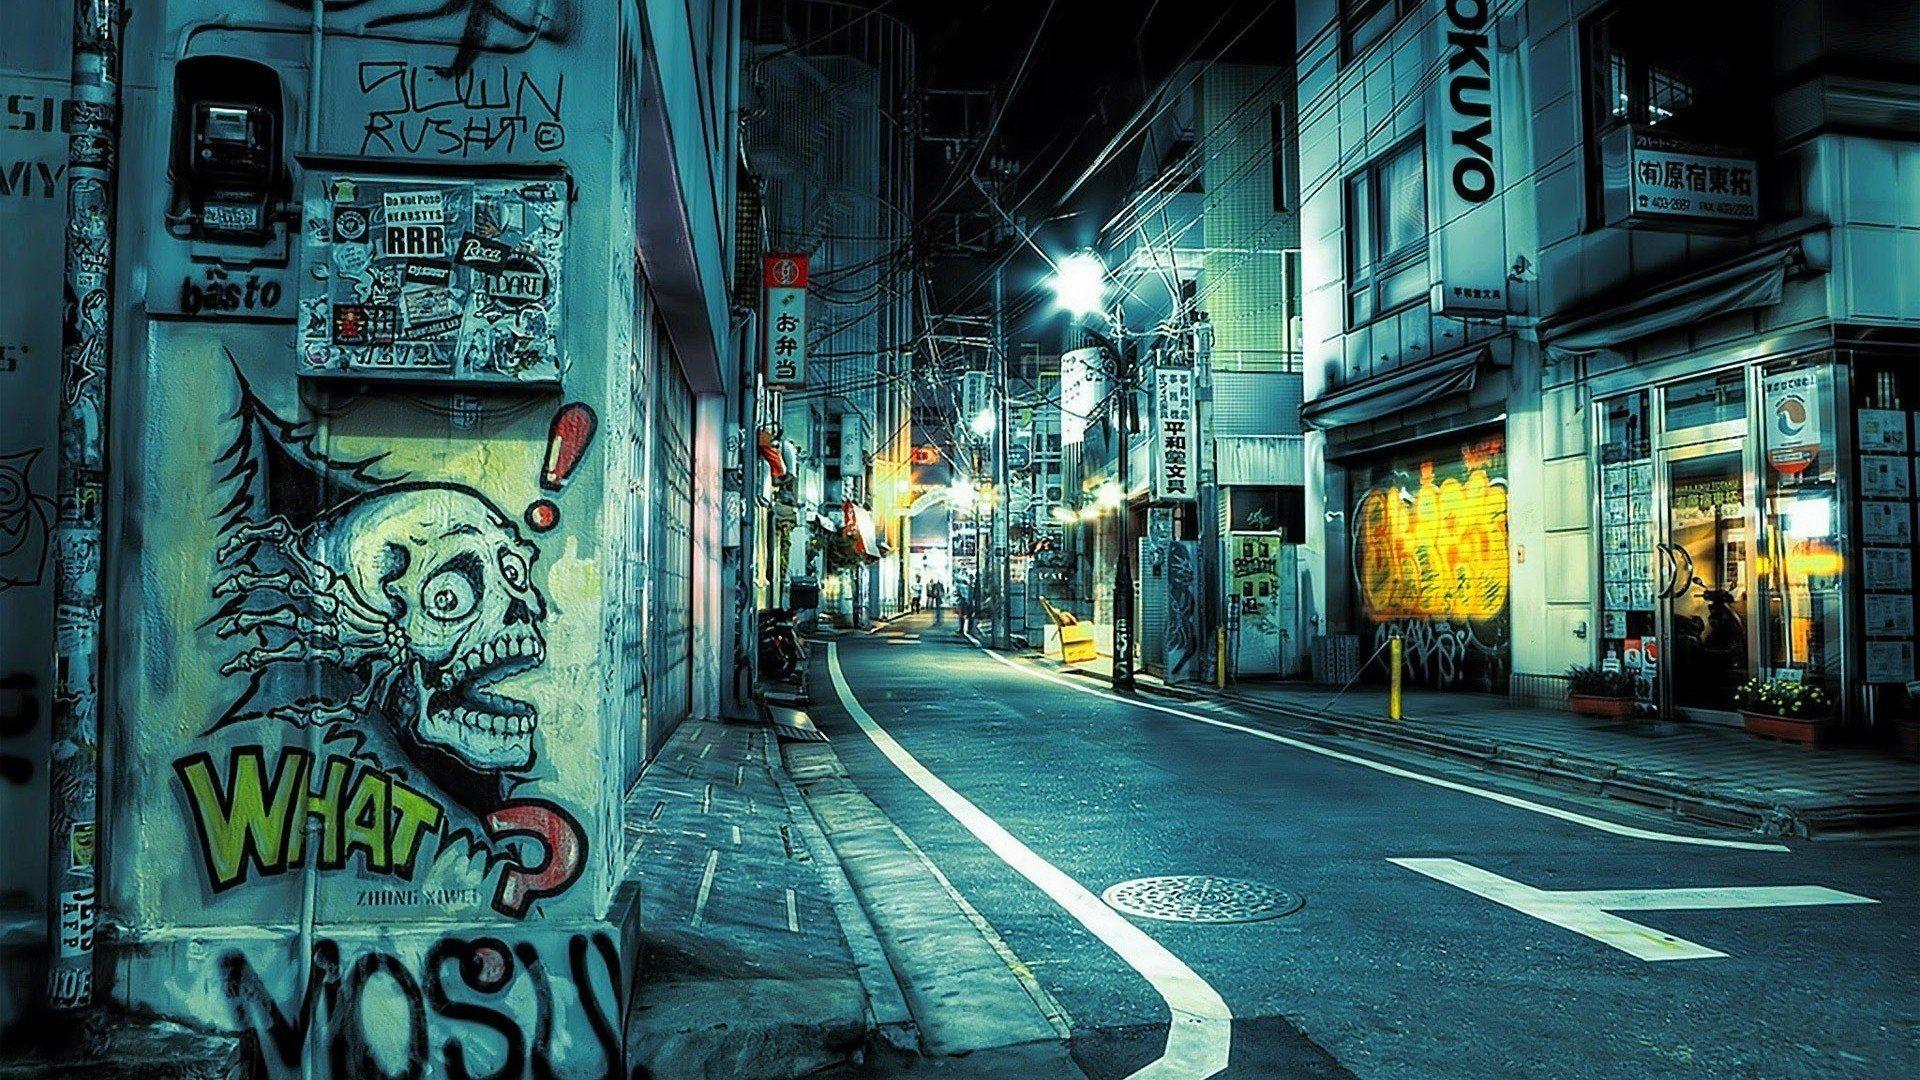 wallpaper street art free hd